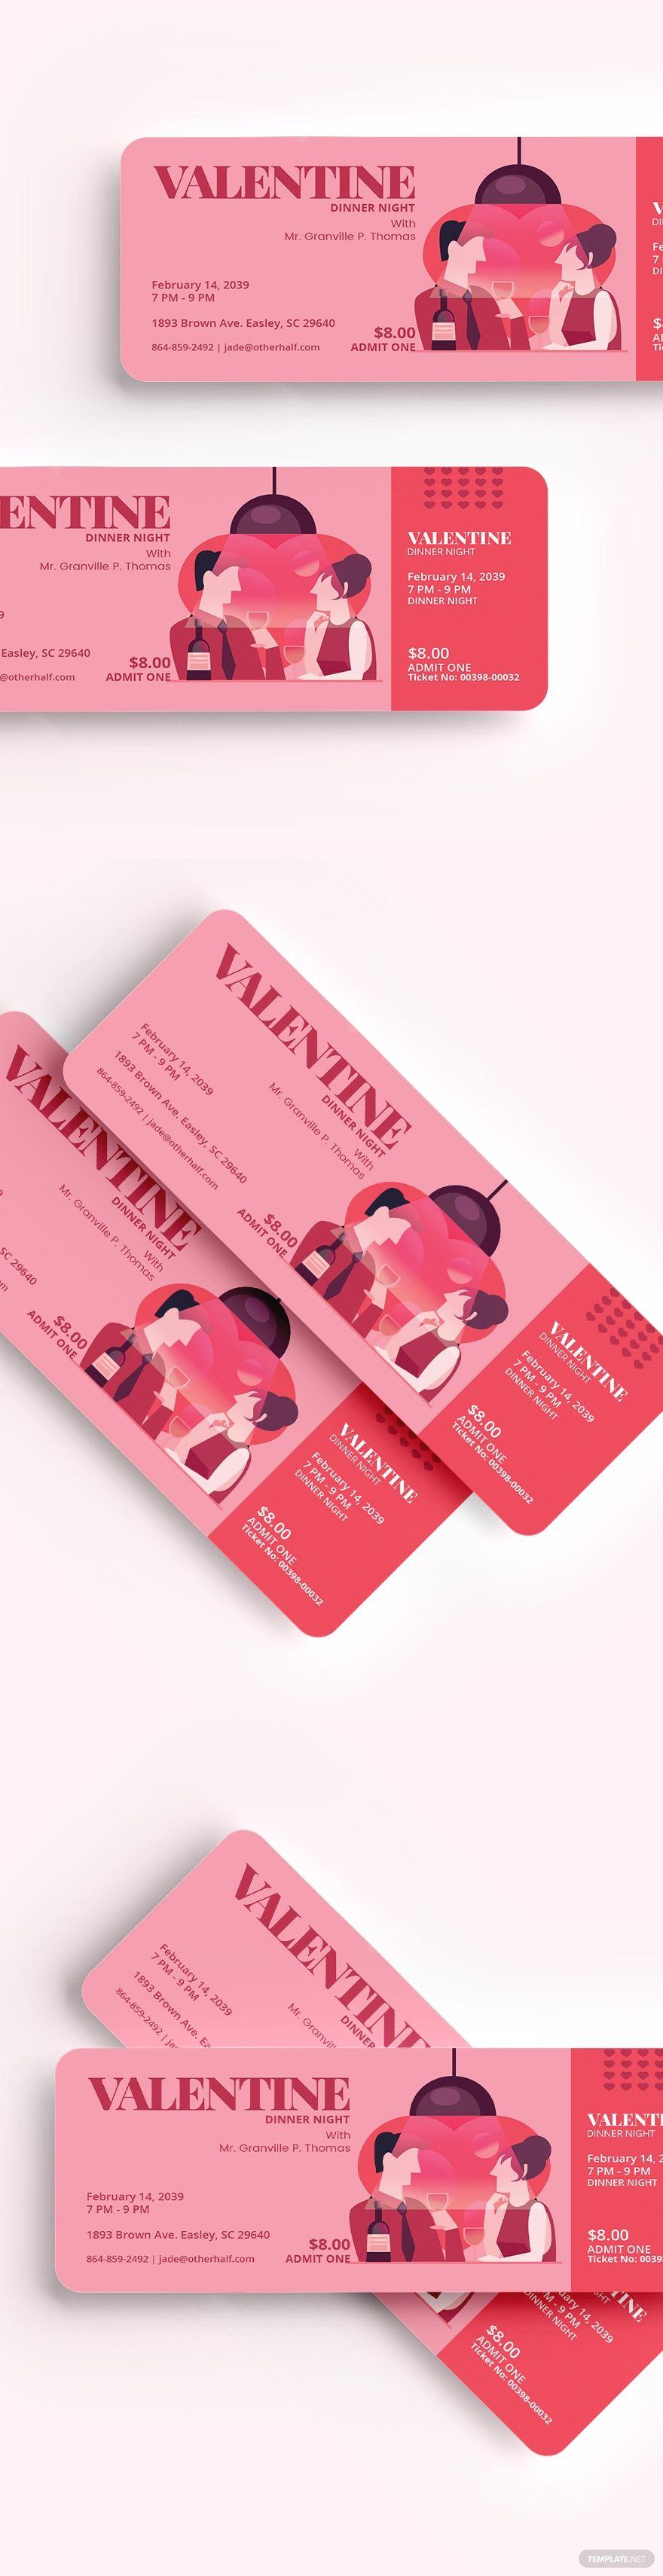 Valentine Dinner Ticket Template Word Doc Psd Apple Mac Pages Illustrator Publisher Valentine Dinner Ticket Template Ticket Design